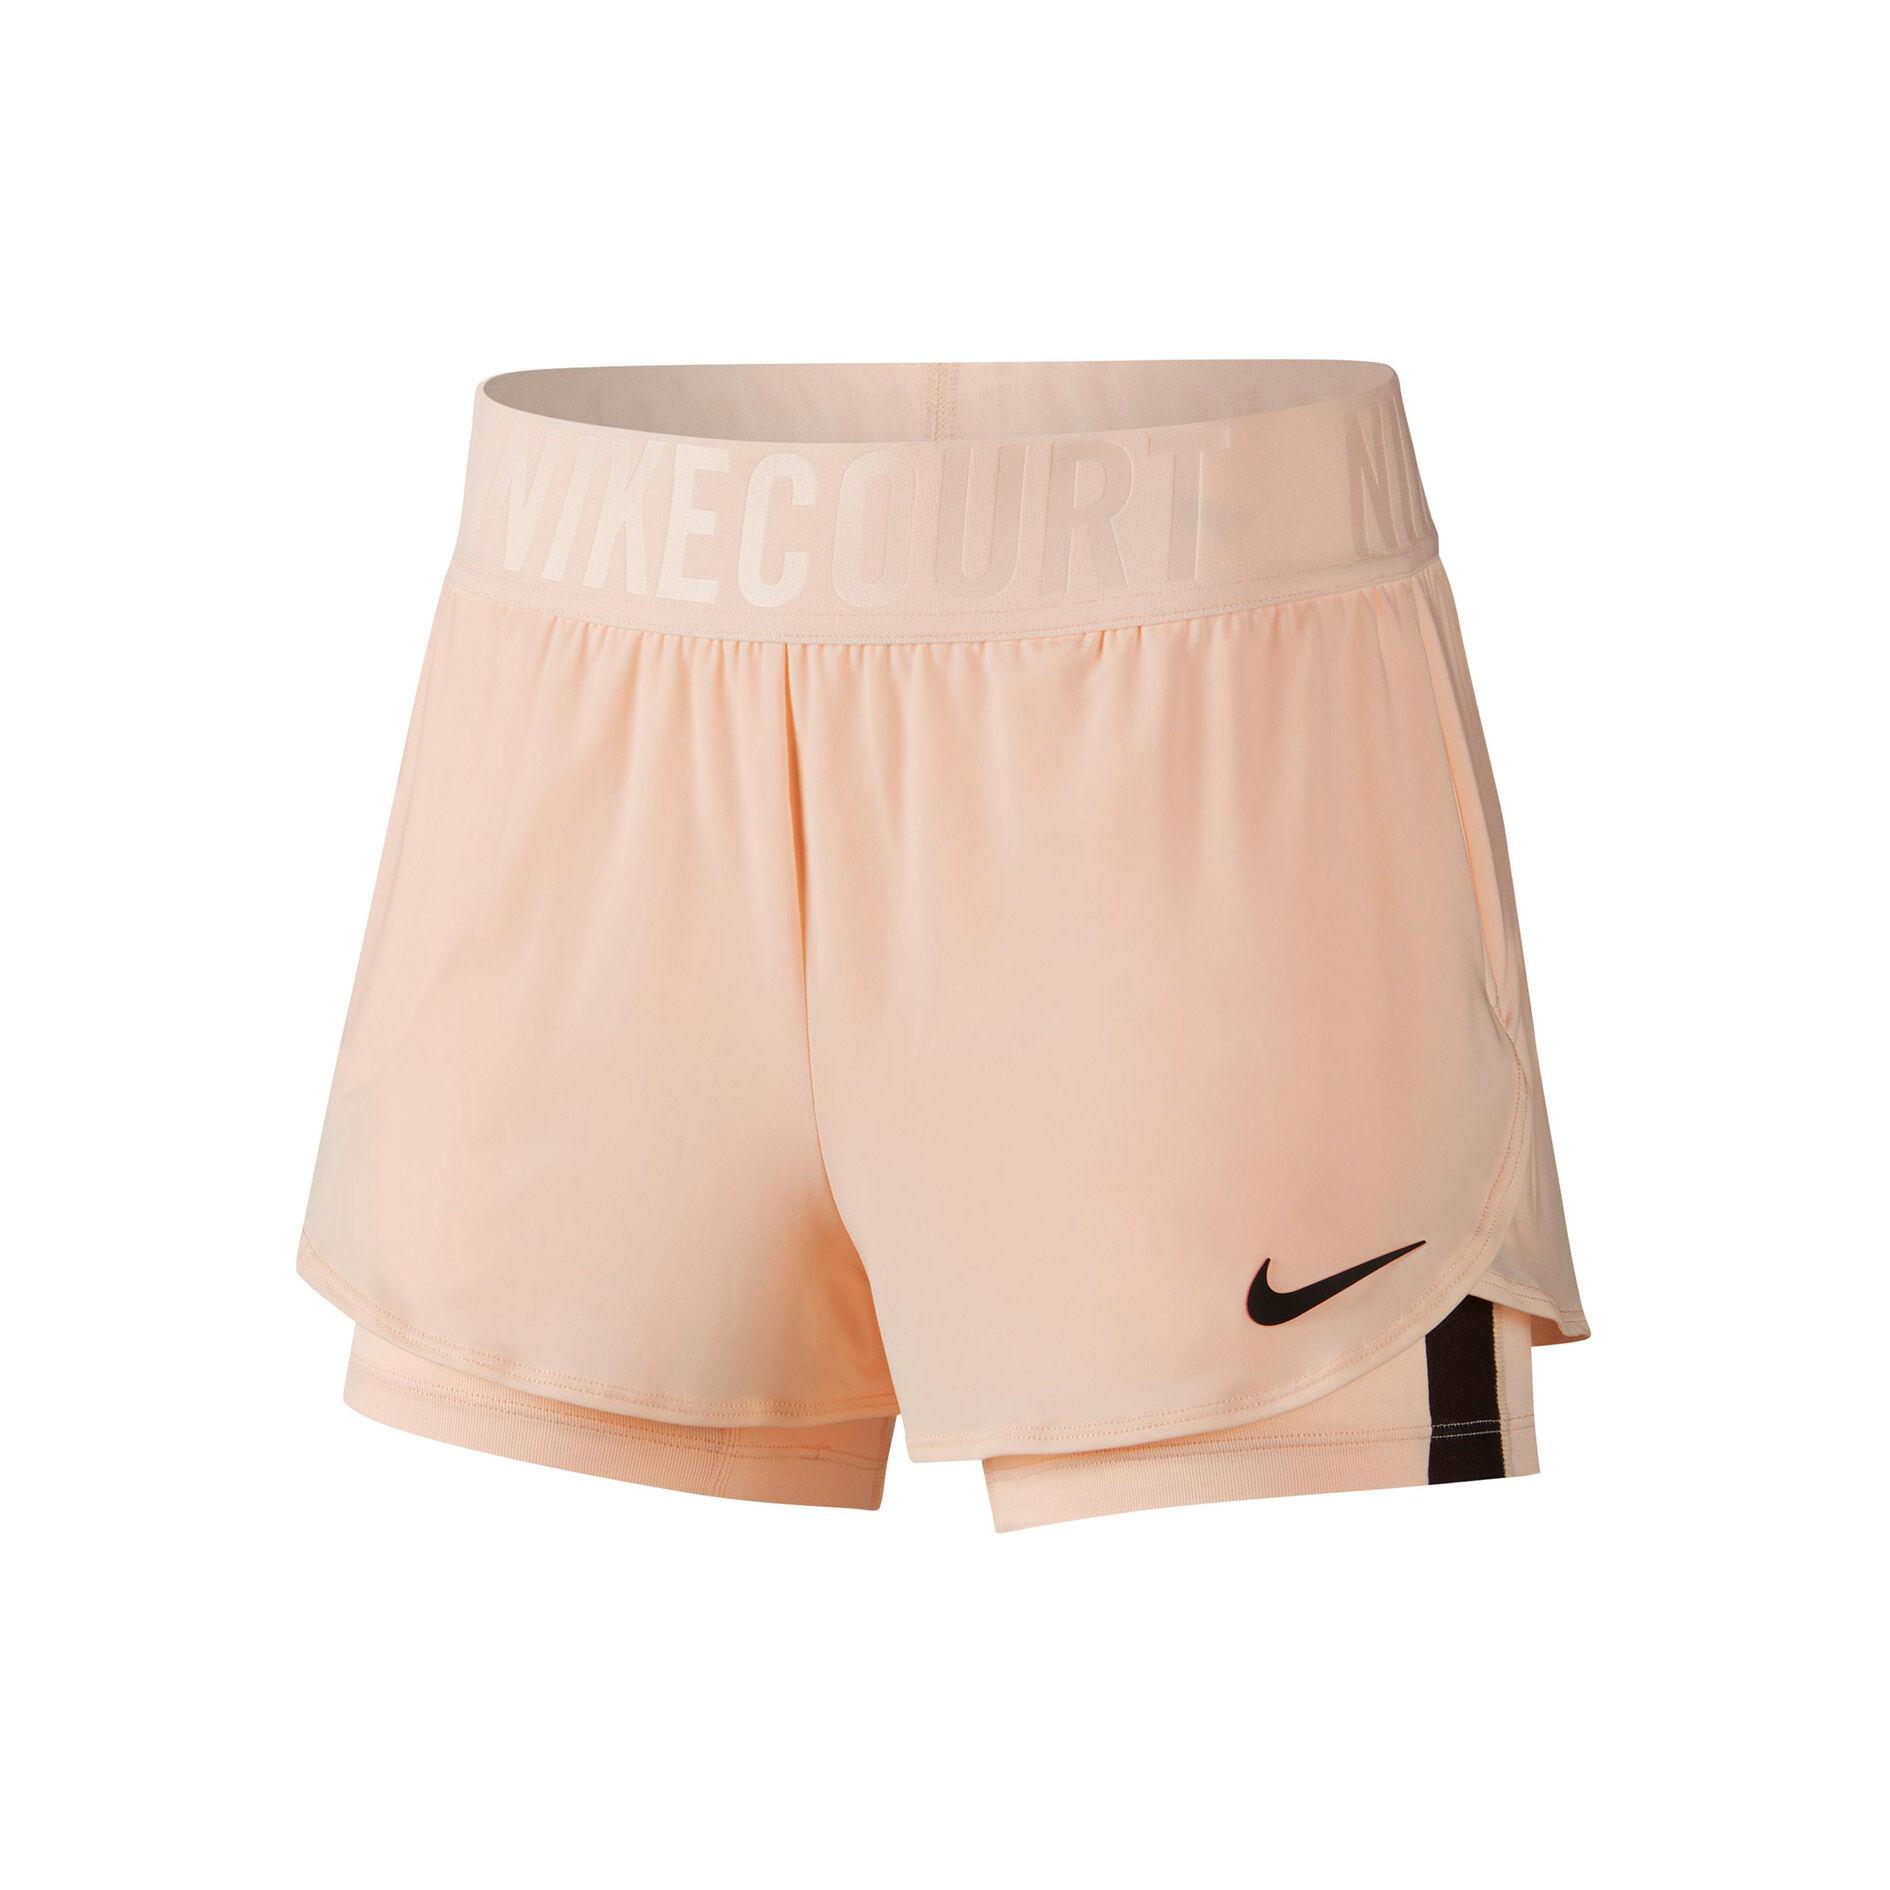 Nike Court Dry Ace Shorts Damen Apricot, Schwarz online